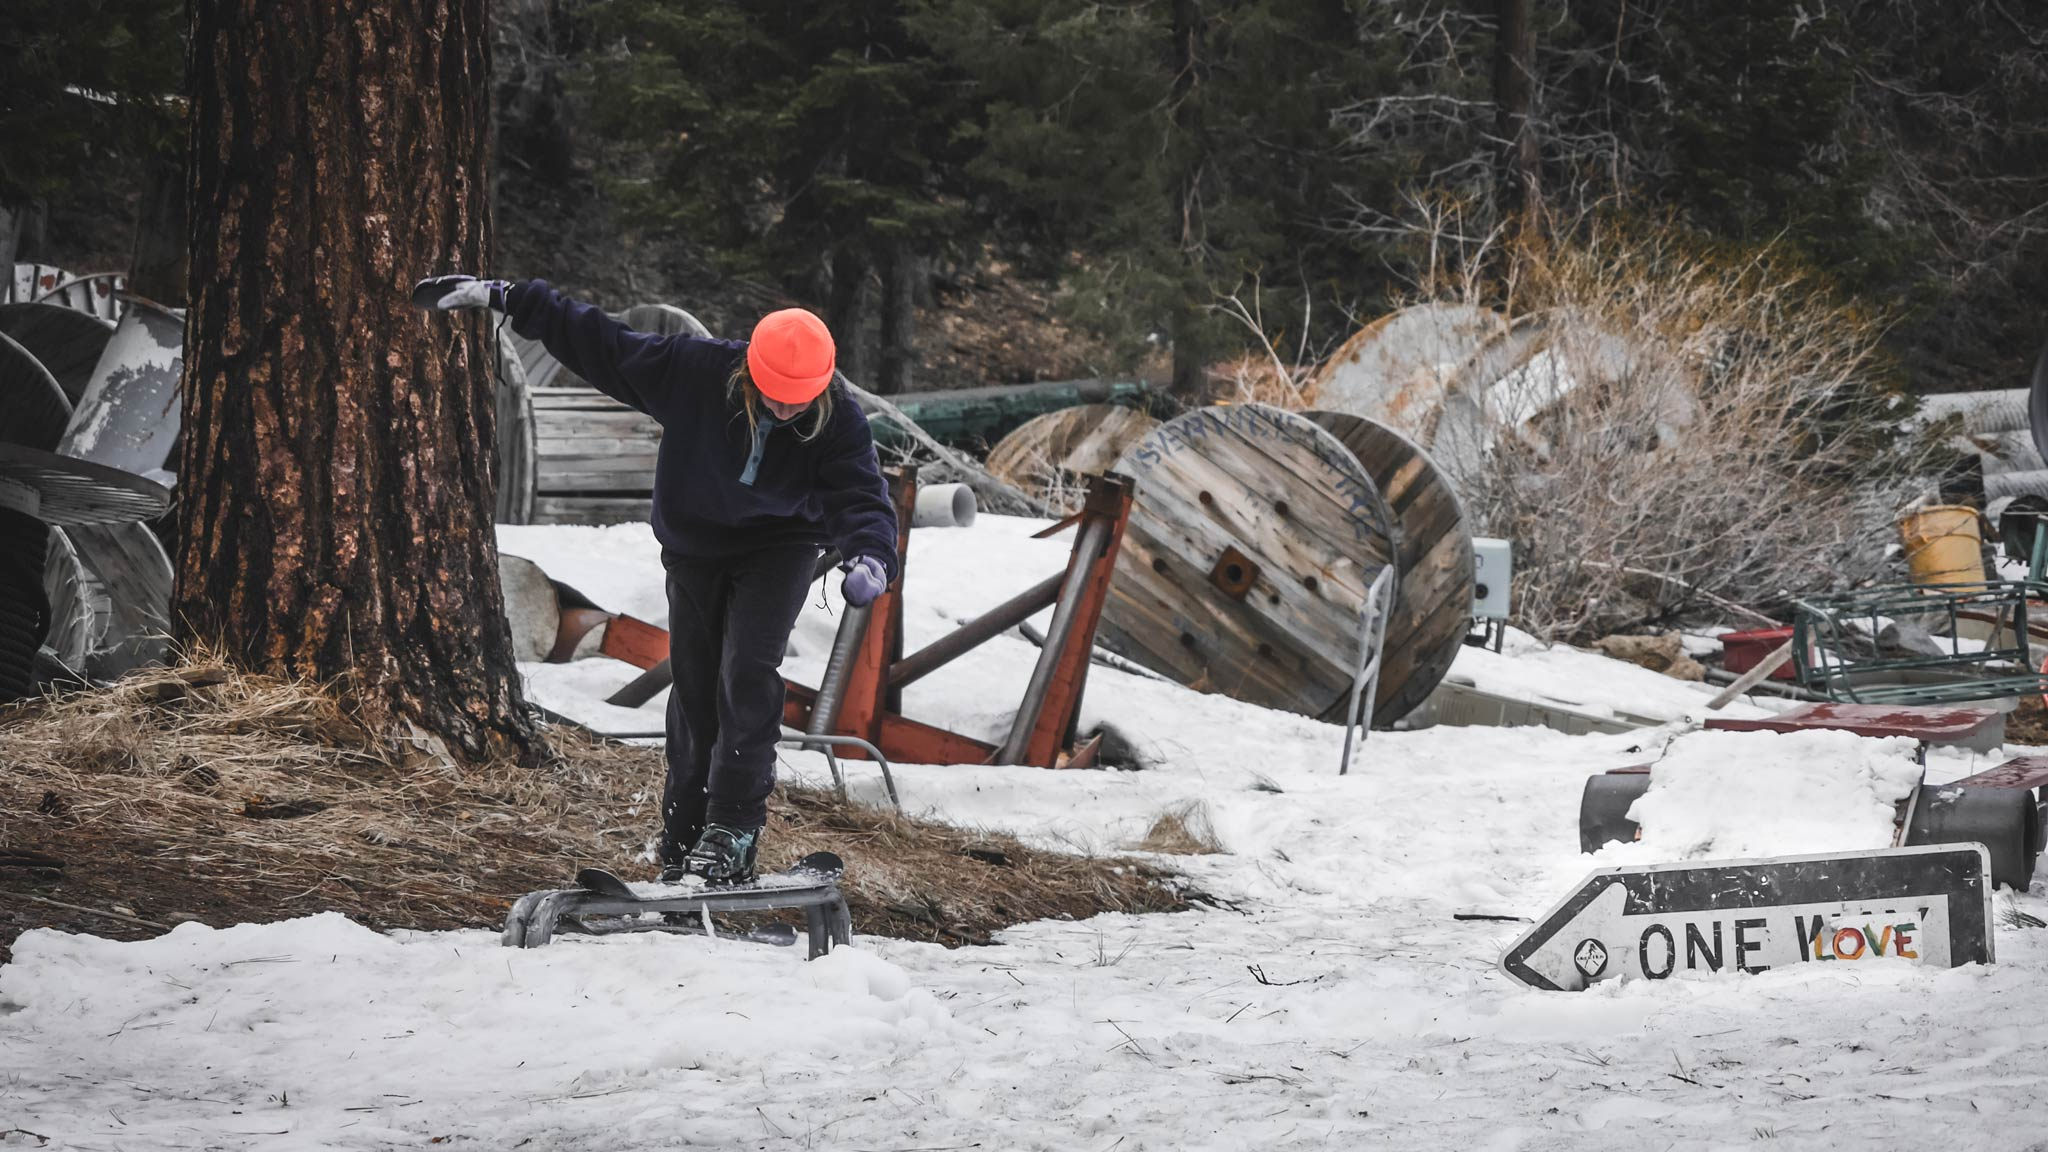 Perfekt zum Jibben: Ein Schrottplatz - Skier: Rosina Friedel